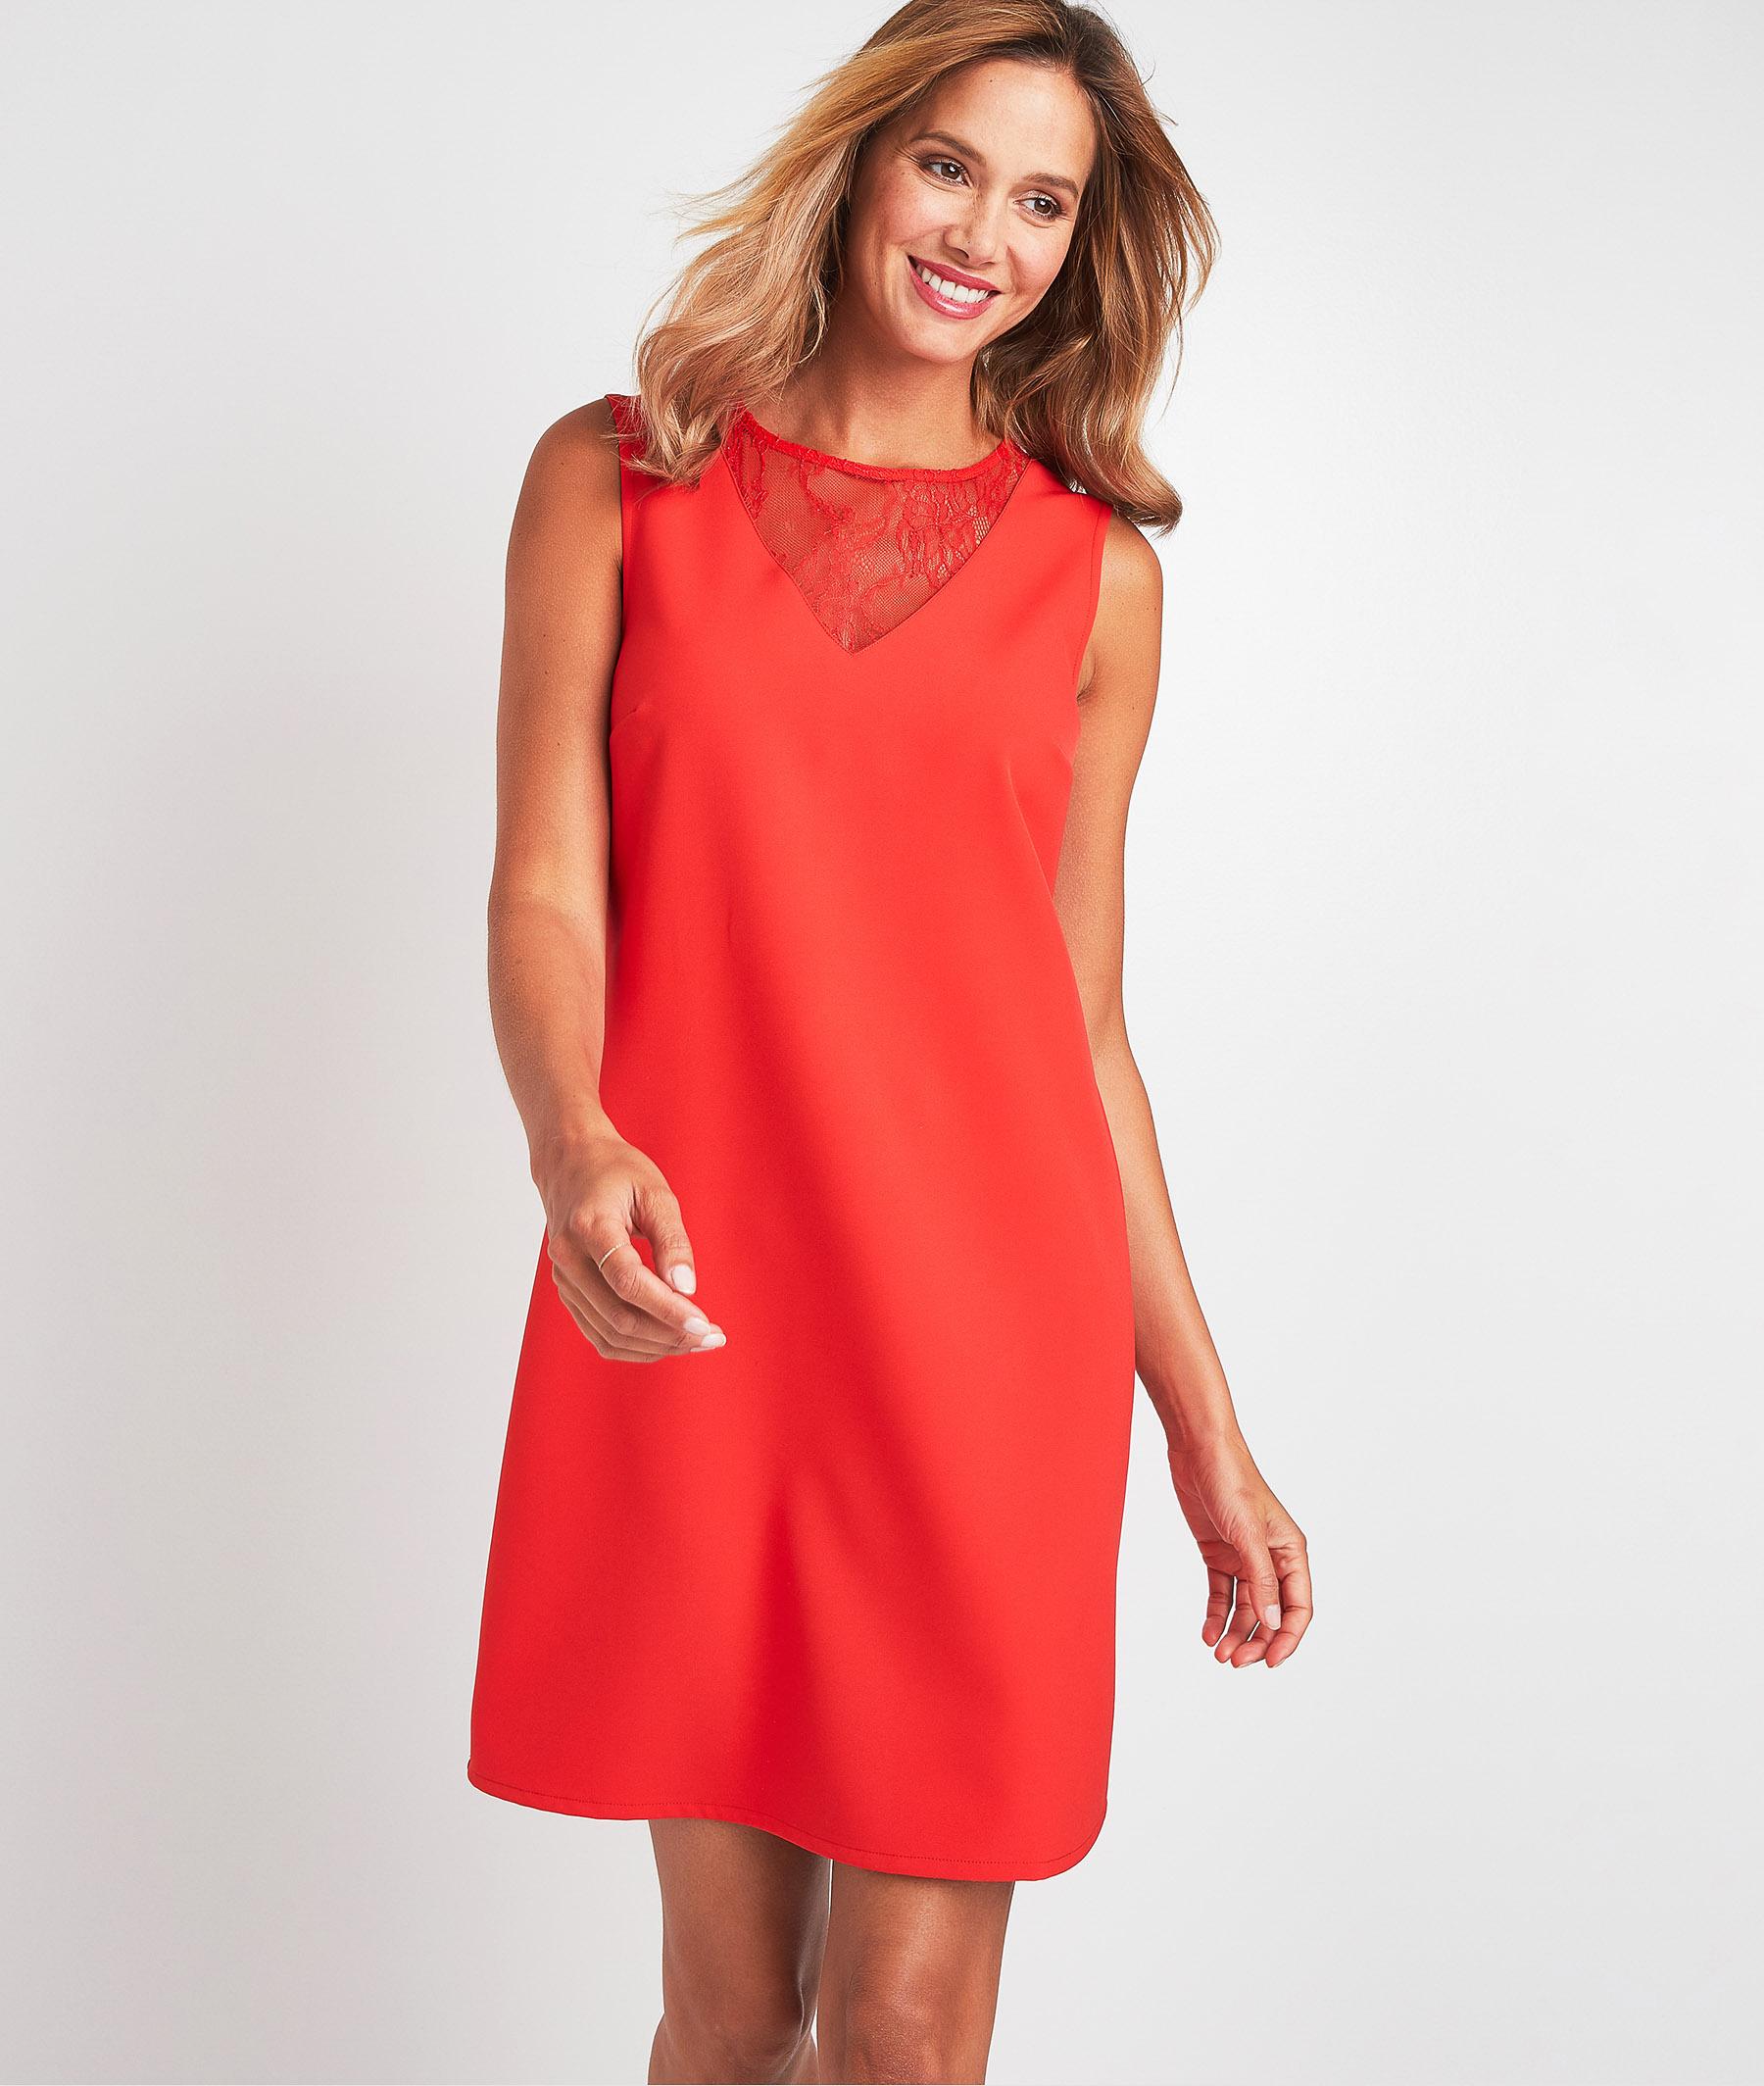 Robe rouge à dentelle femme ROUGE